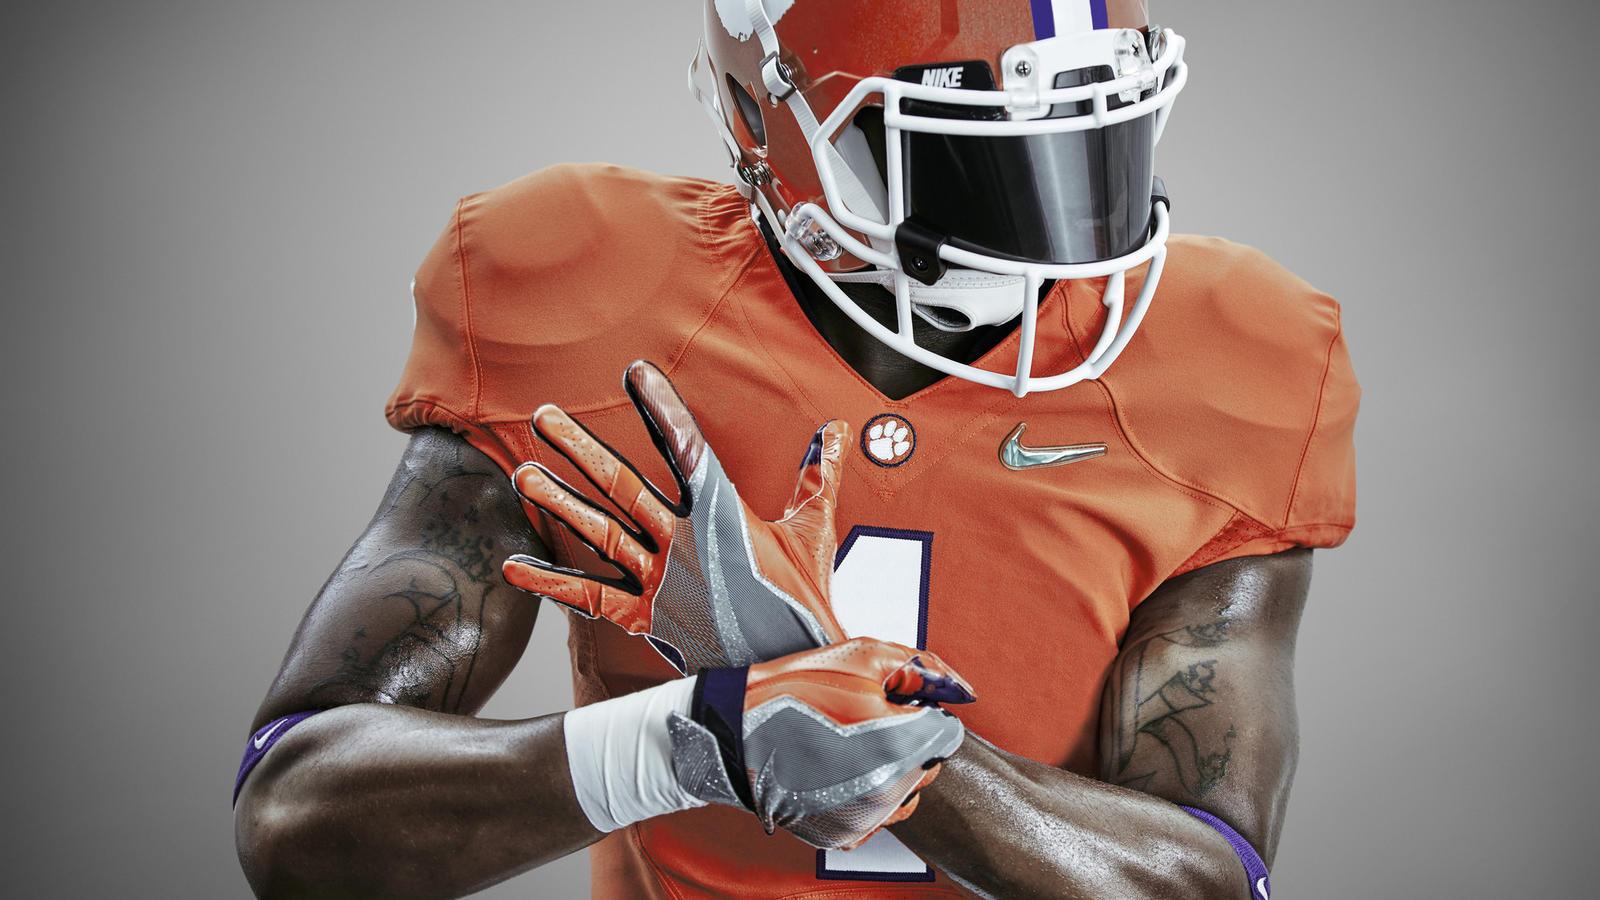 official photos f6d19 8f4dd Nike Reveals College Football Playoff Uniform Looks - Nike News